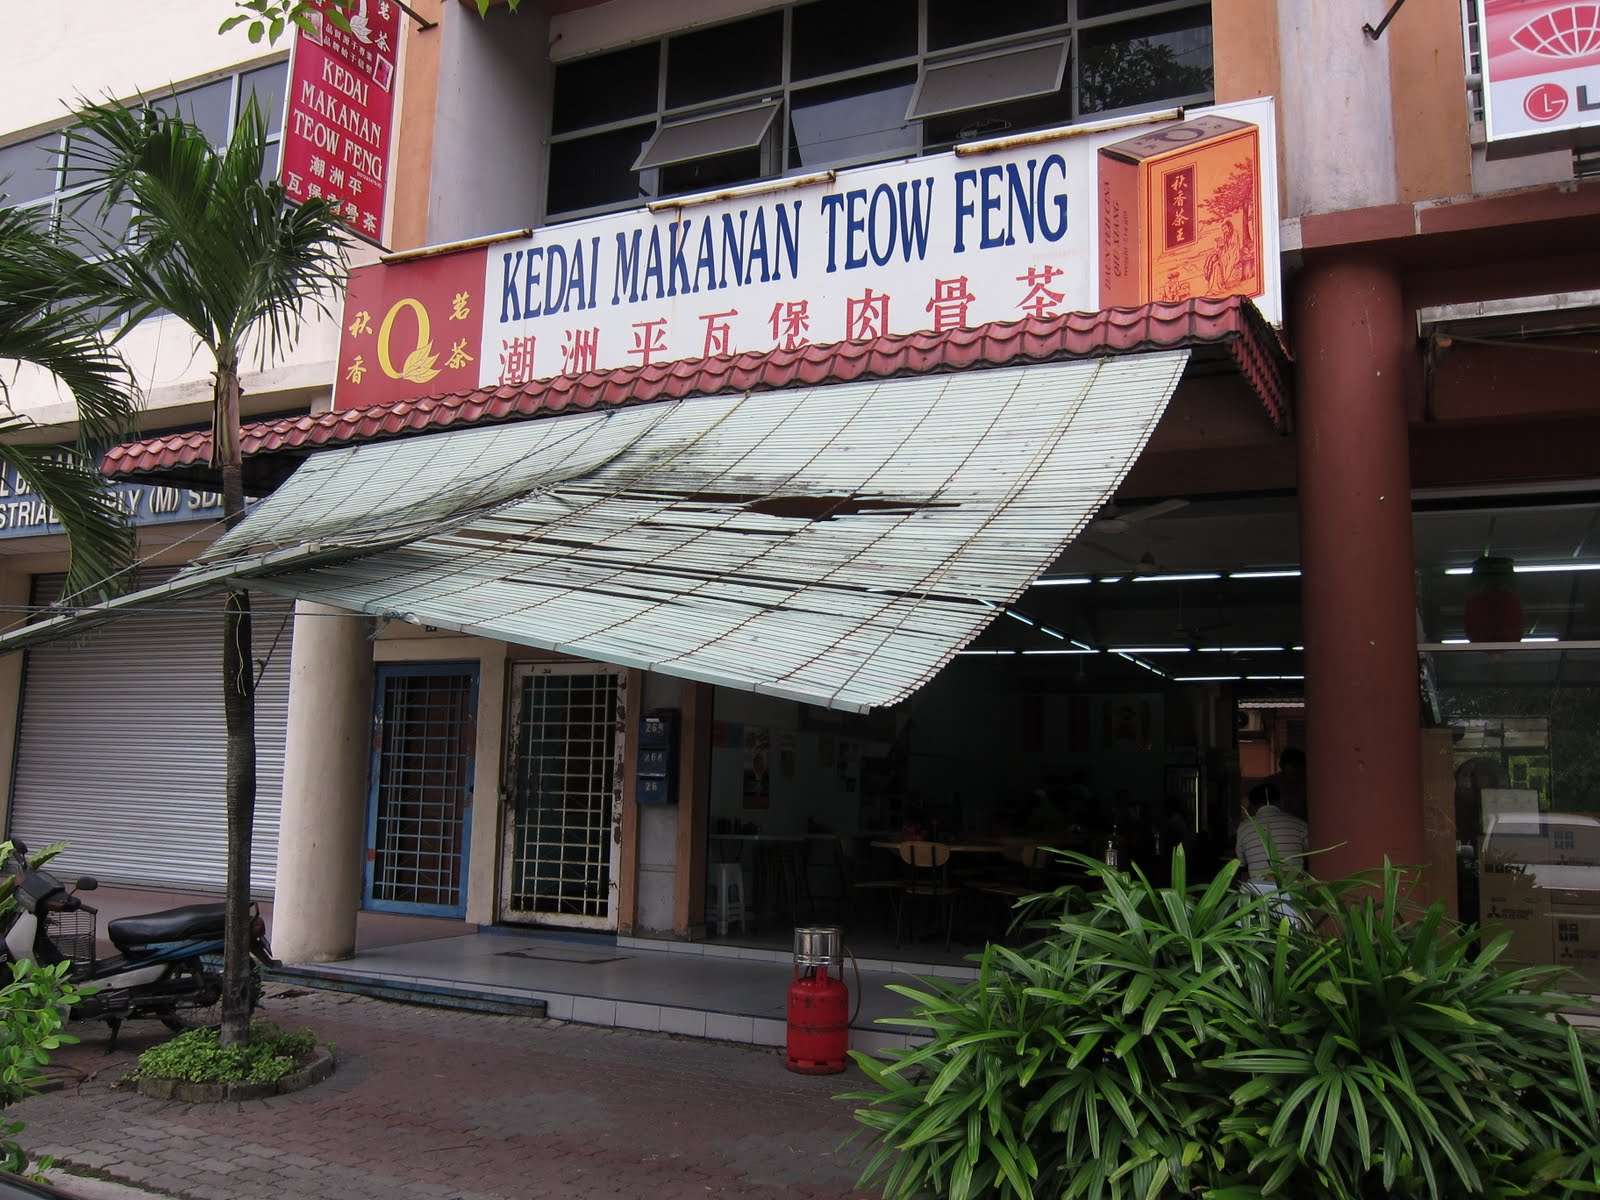 Food 2 Buzz Kedai Makanan Teow Feng Taman Sri Muda Shah Alam